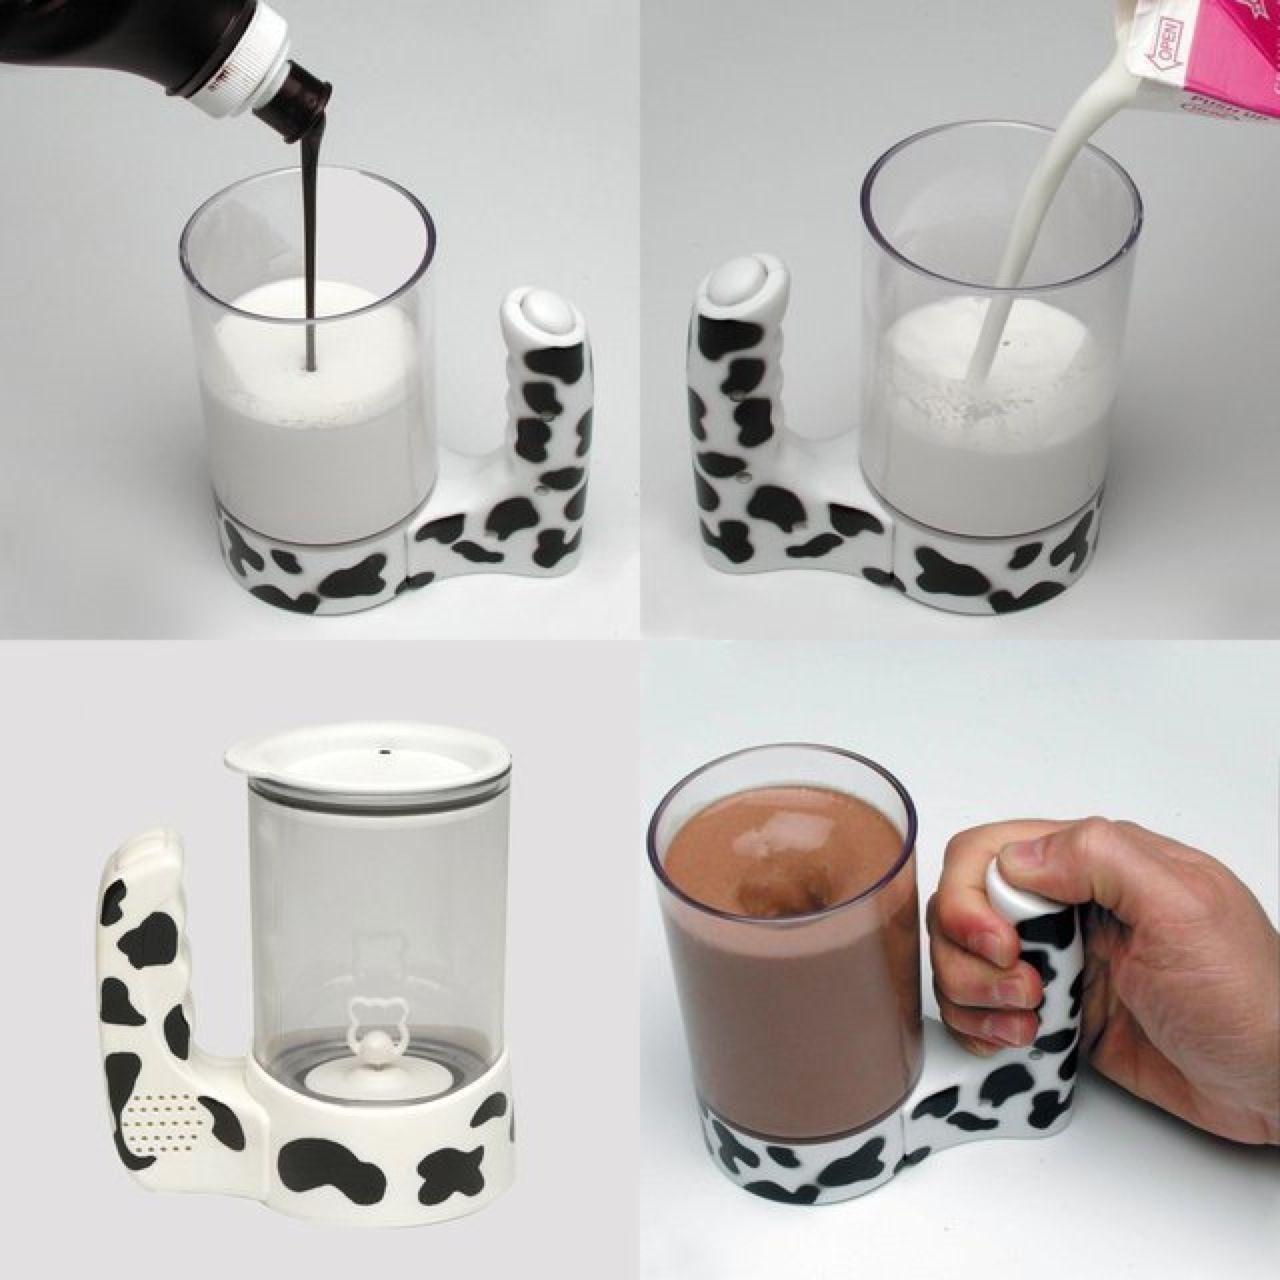 Chocolate milk fun cool things pinterest for Instrumentos para cocina